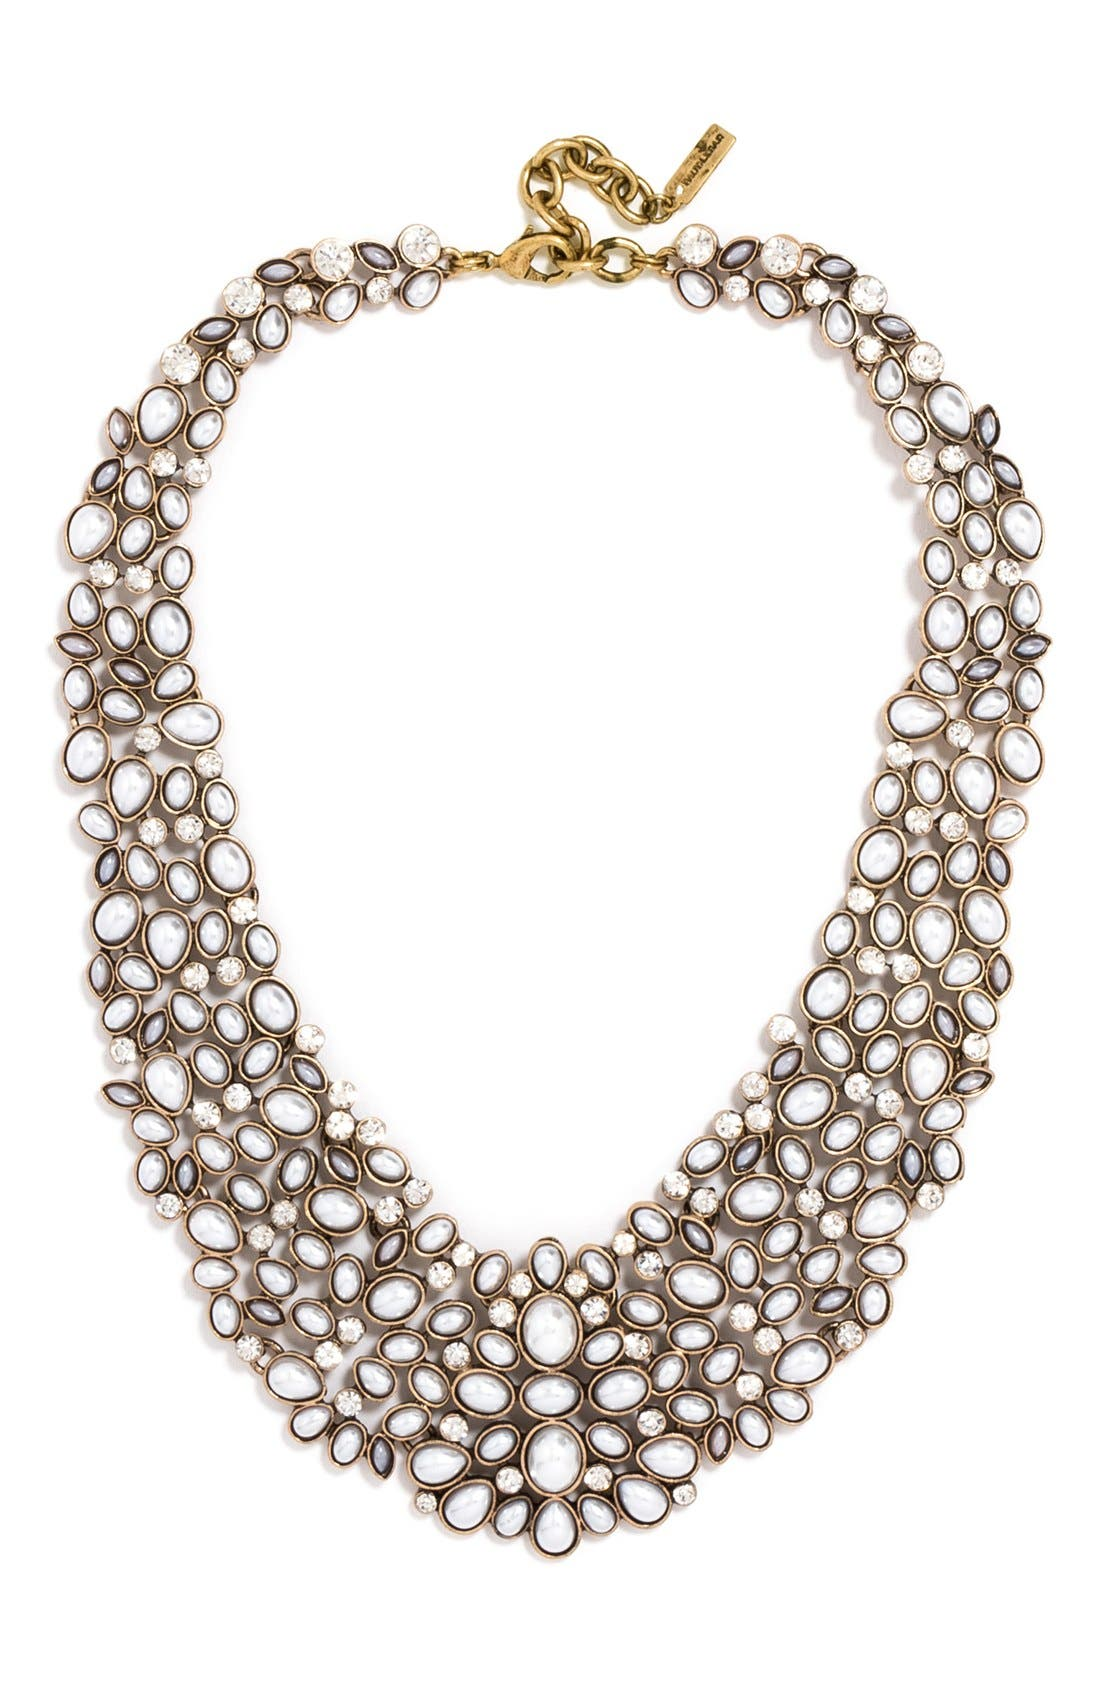 Main Image - BaubleBar 'Kew' Crystal Collar Necklace